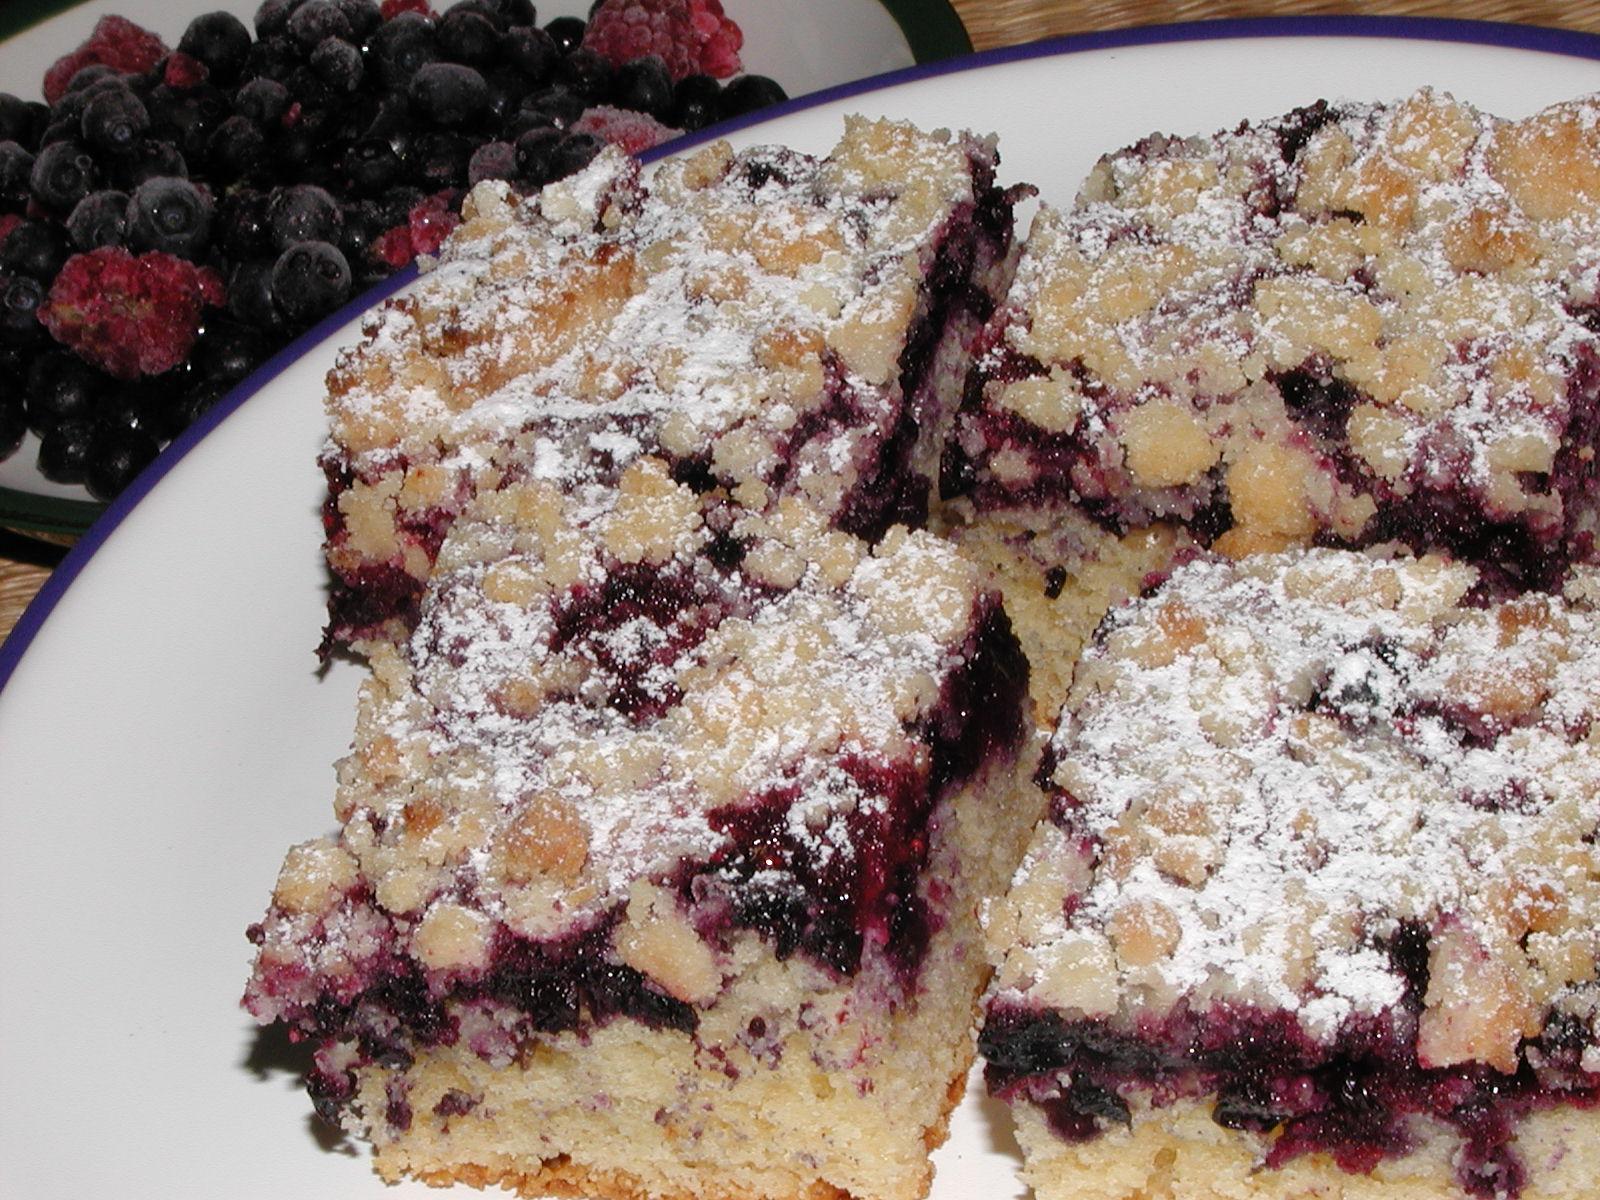 Litý koláč s borůvkami